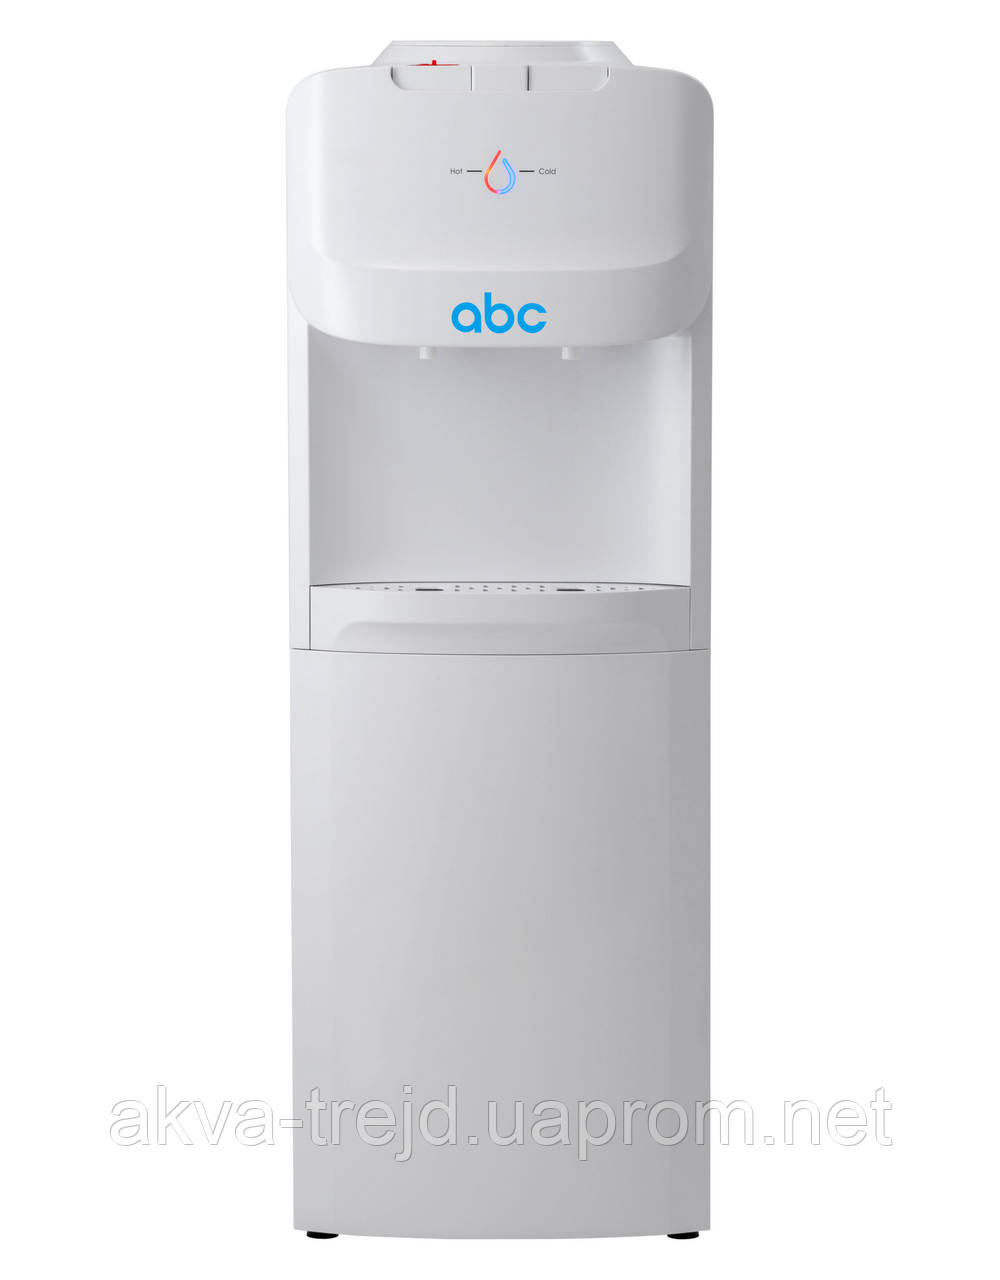 Кулер для воды ABC V170E с электронным охлаждением